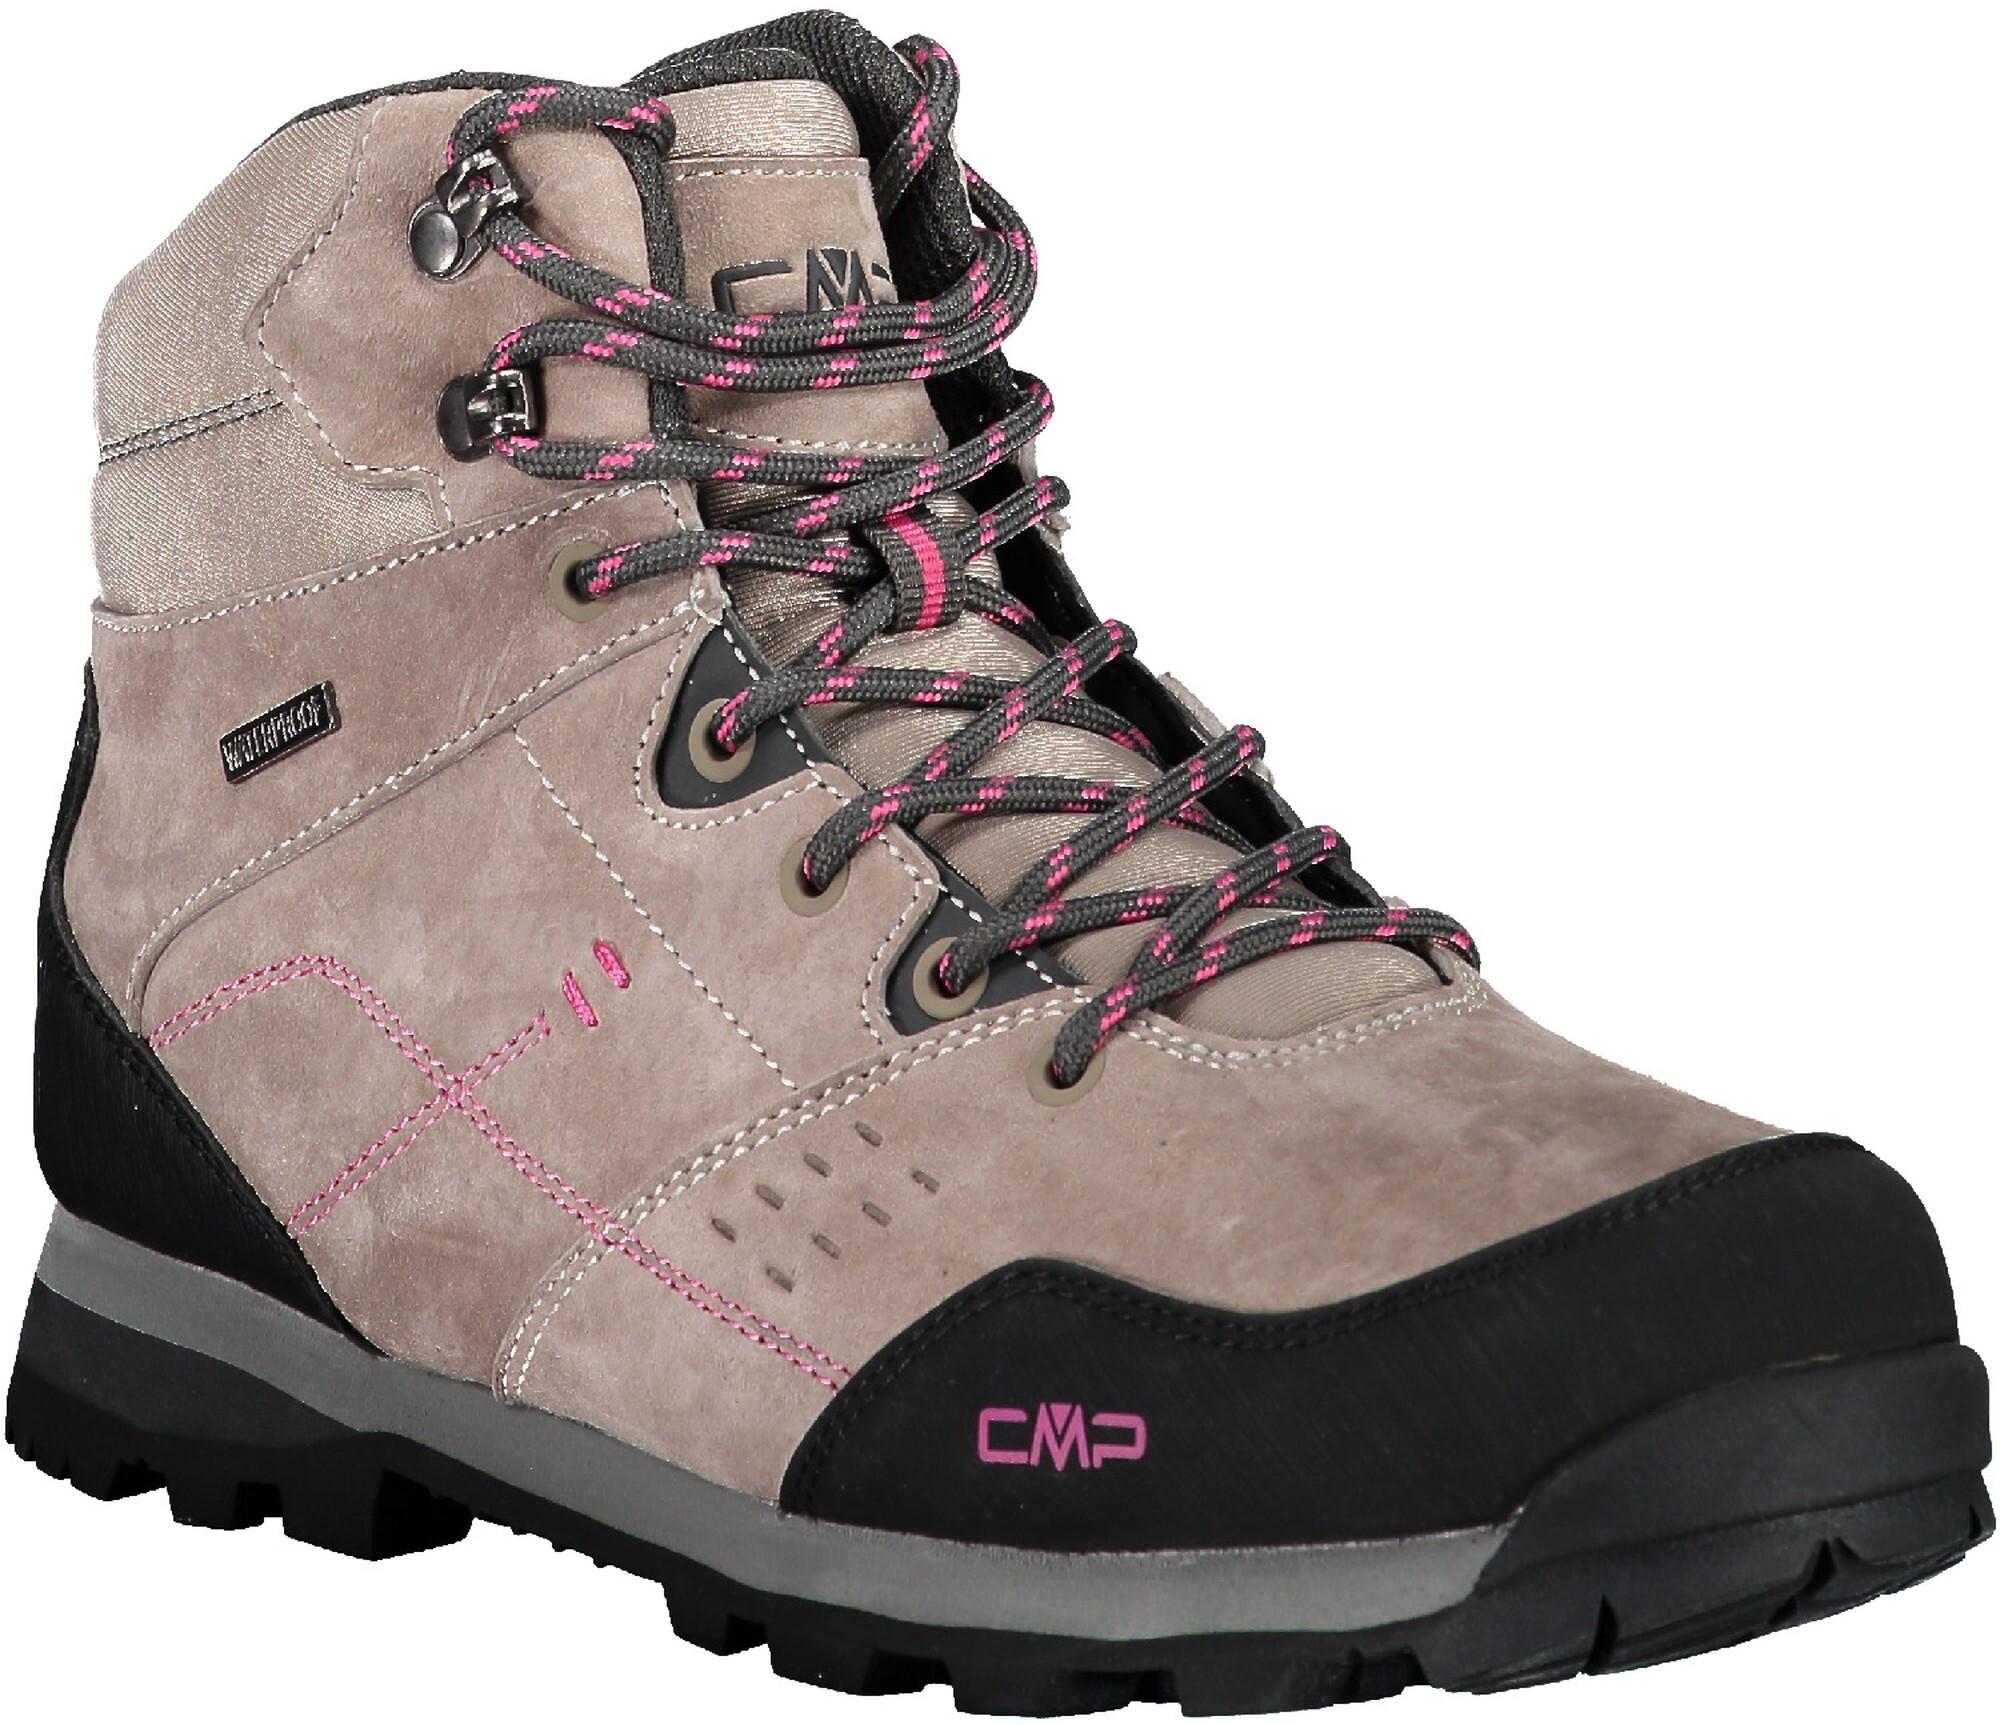 CMP Campagnolo Alcor WP Mid Cut Trekkingschuhe Damen | 3b9cj